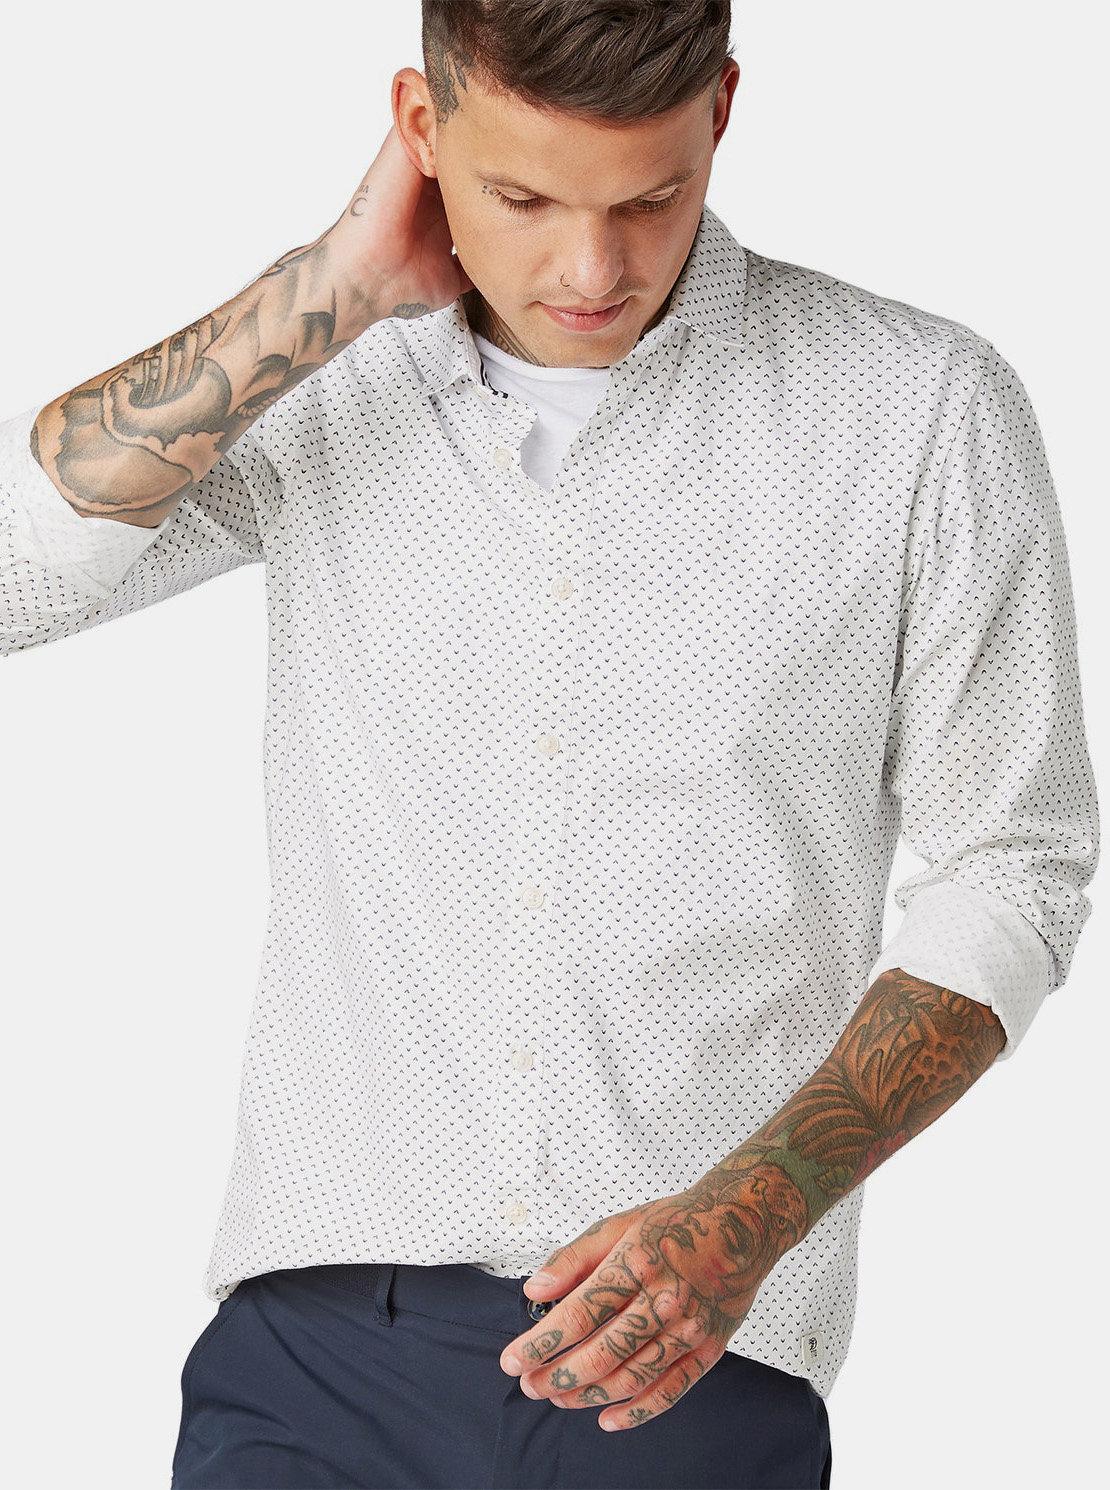 d2d537fd7851 Bílá pánská vzorovaná košile Tom Tailor Denim ...